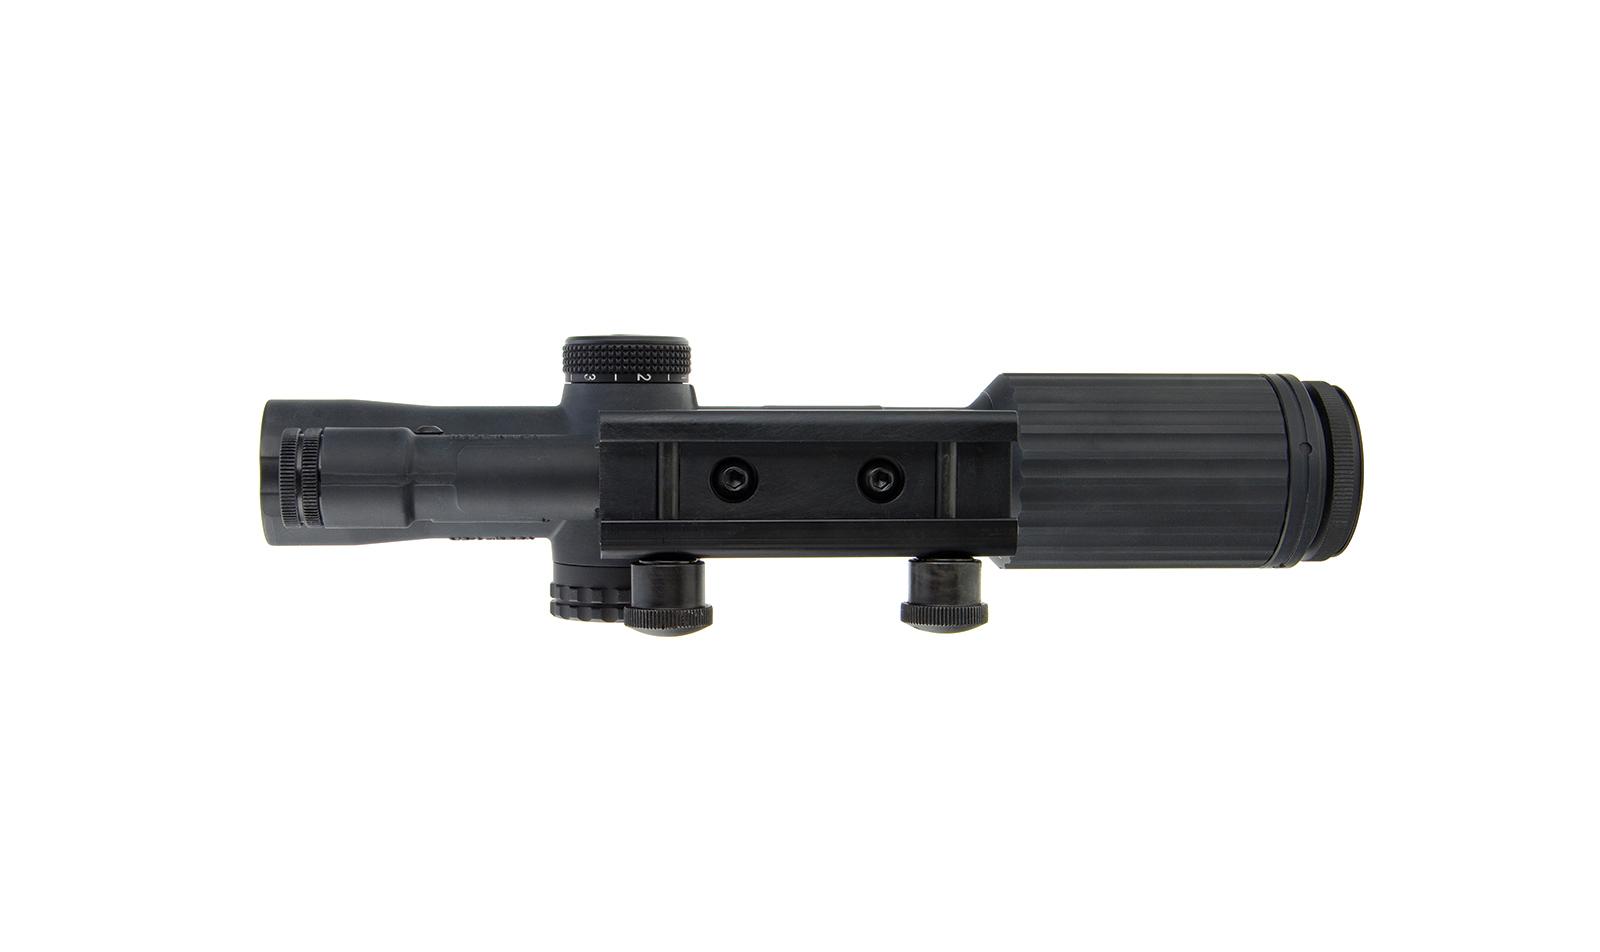 VC16-C-1600001 angle 10